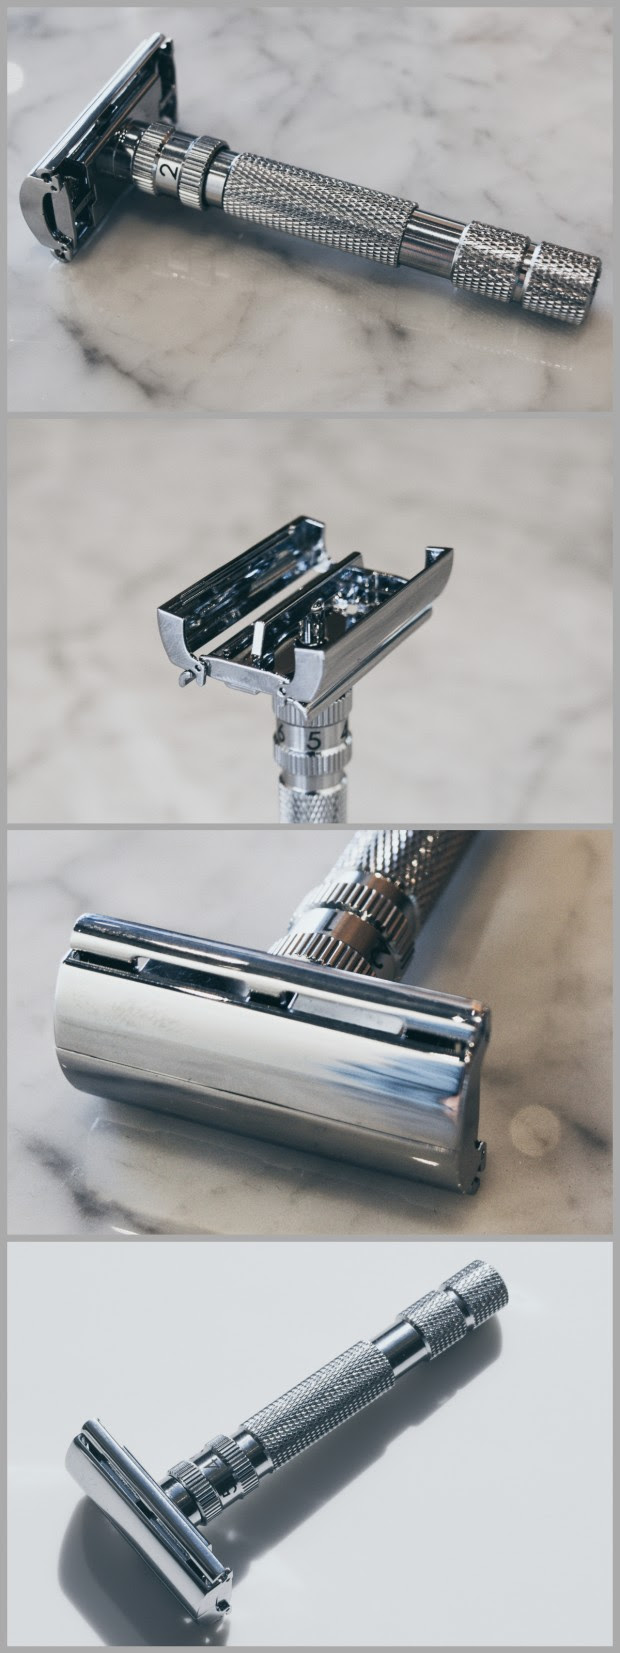 Nouveau Rockwell Model T Razor - Page 3 Unname11